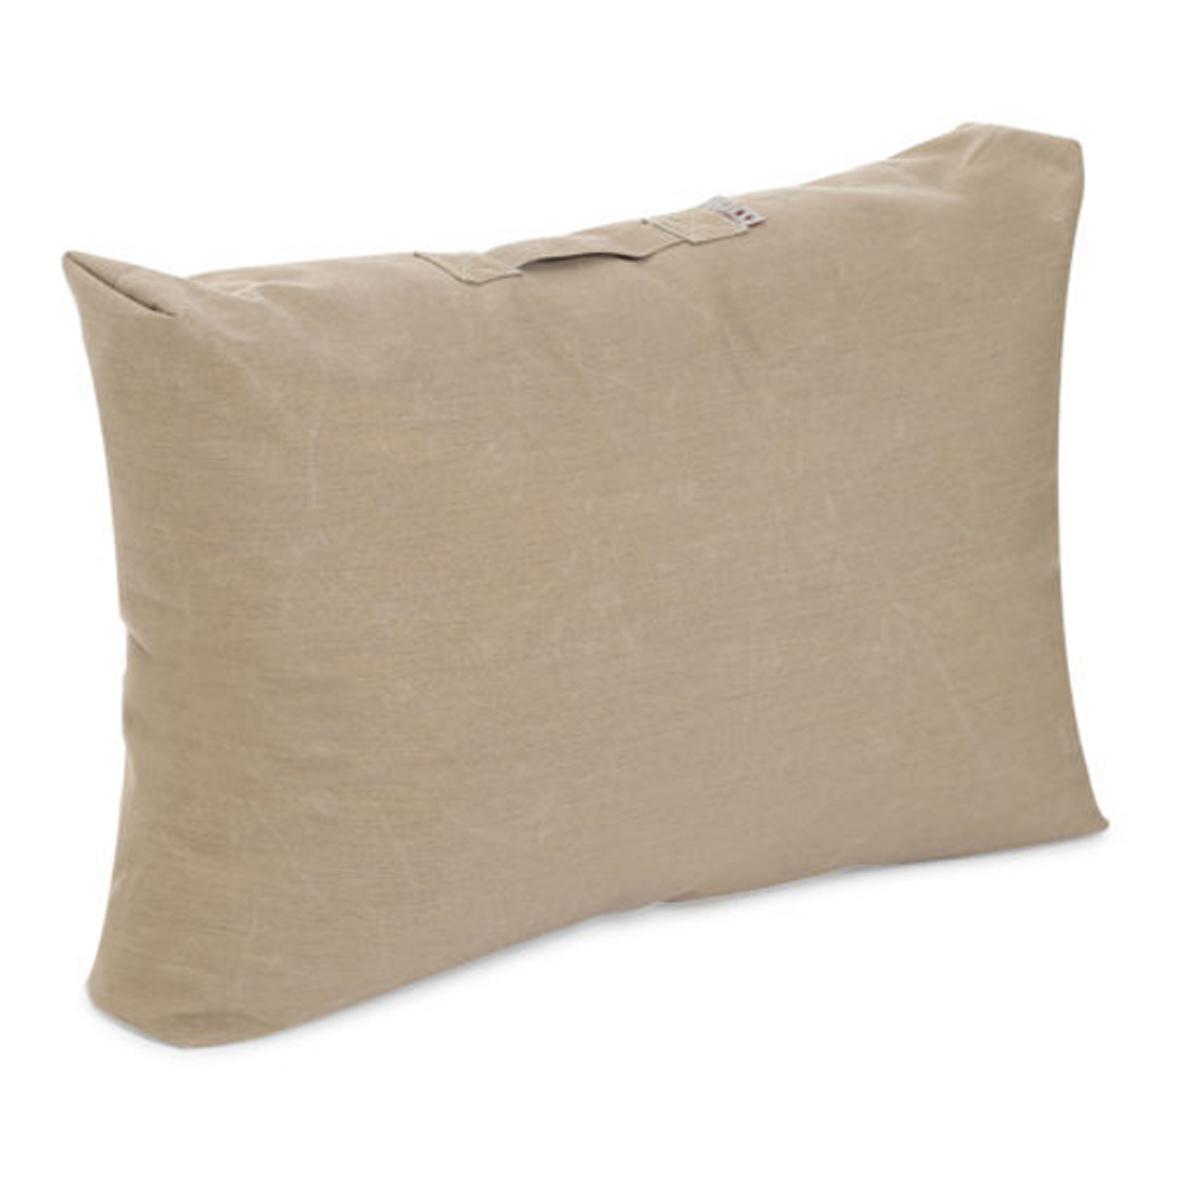 Felix cushion